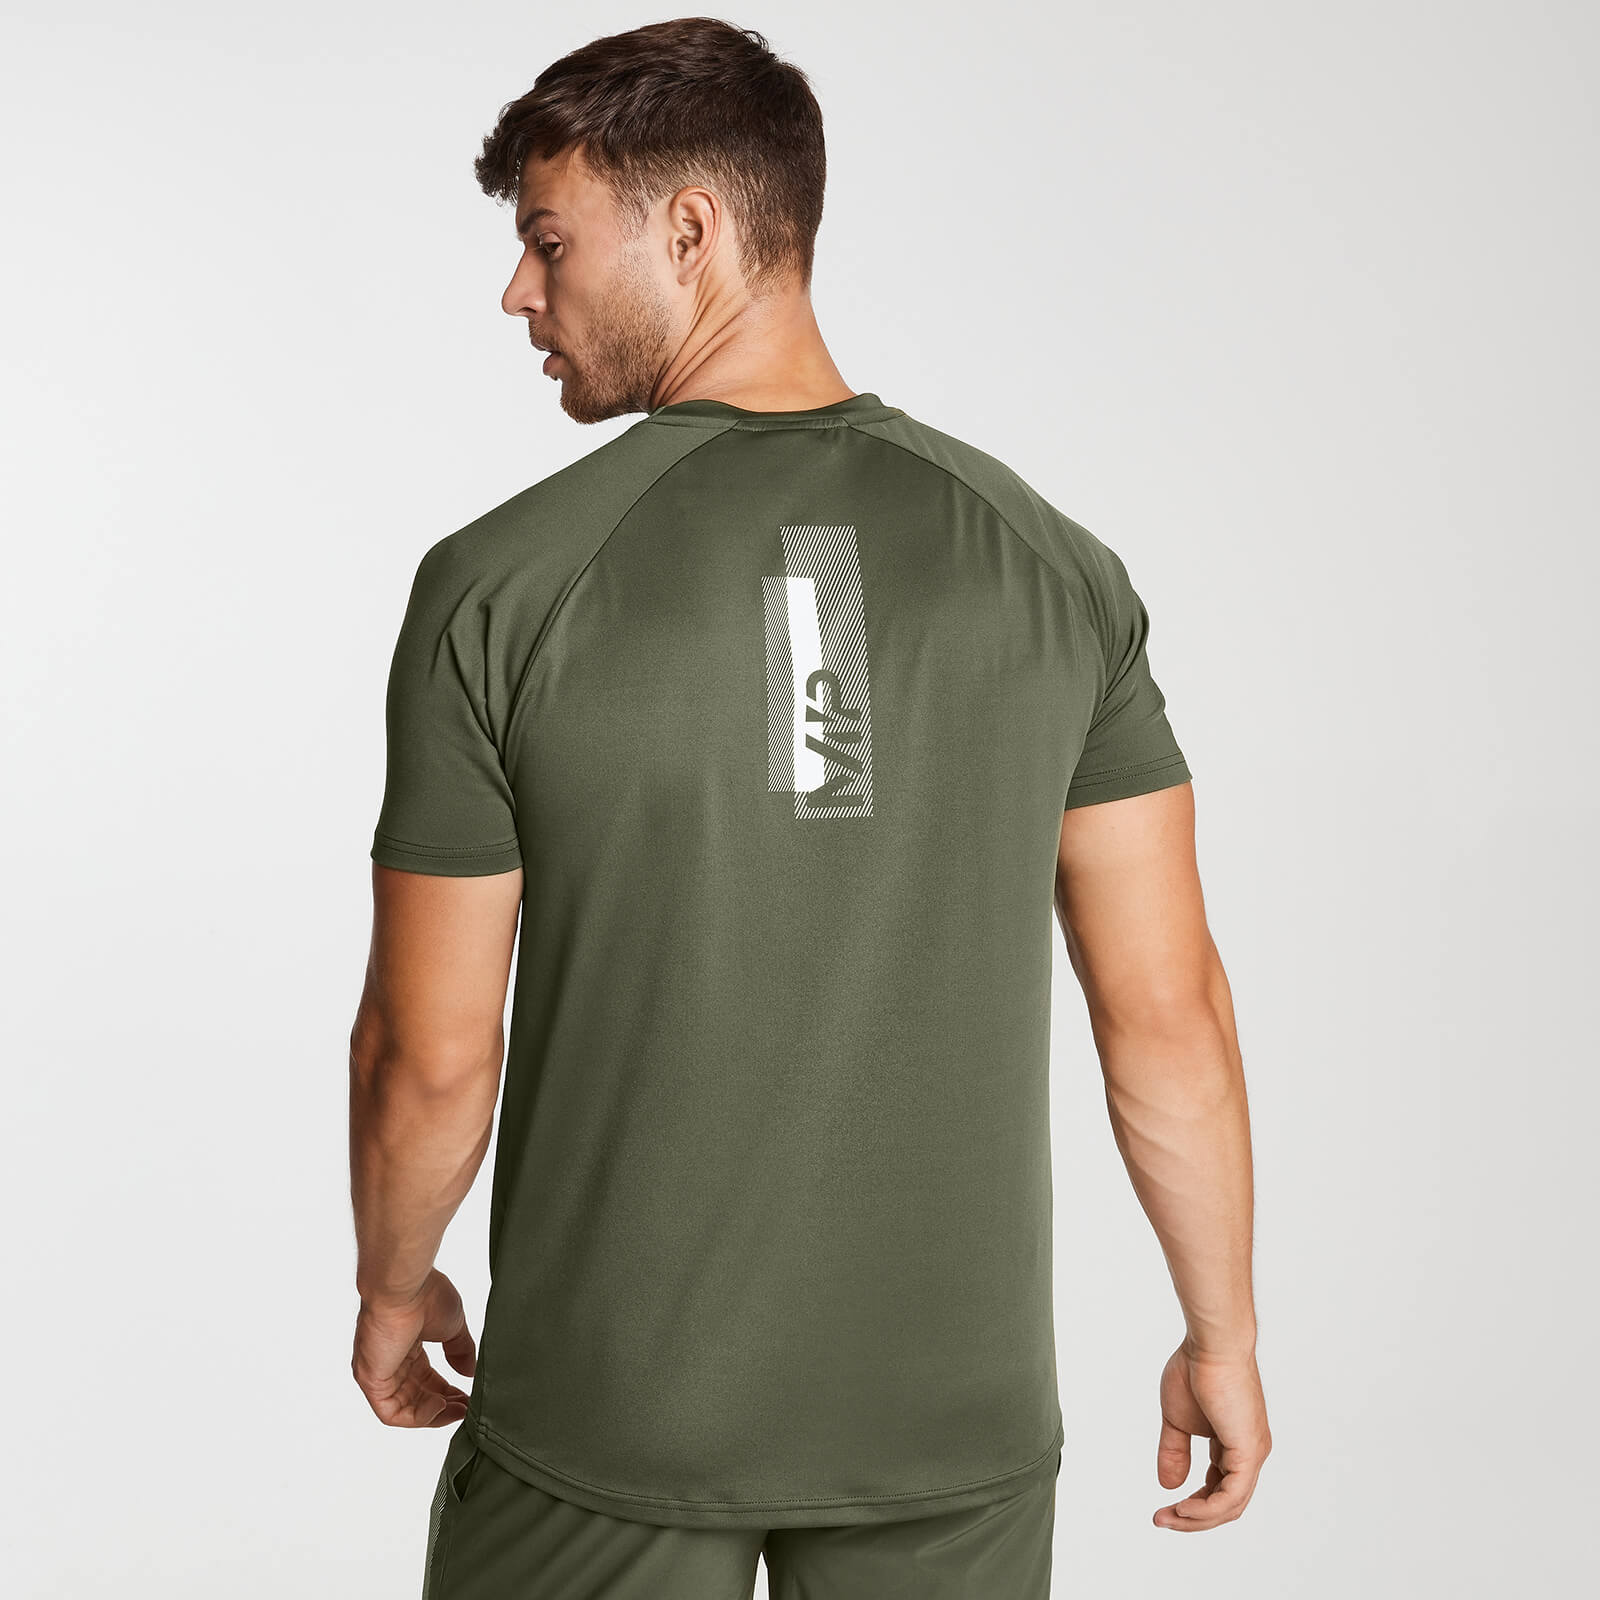 Men's Printed Kortermet trenings T skjorte | Svart | MYPROTEIN™